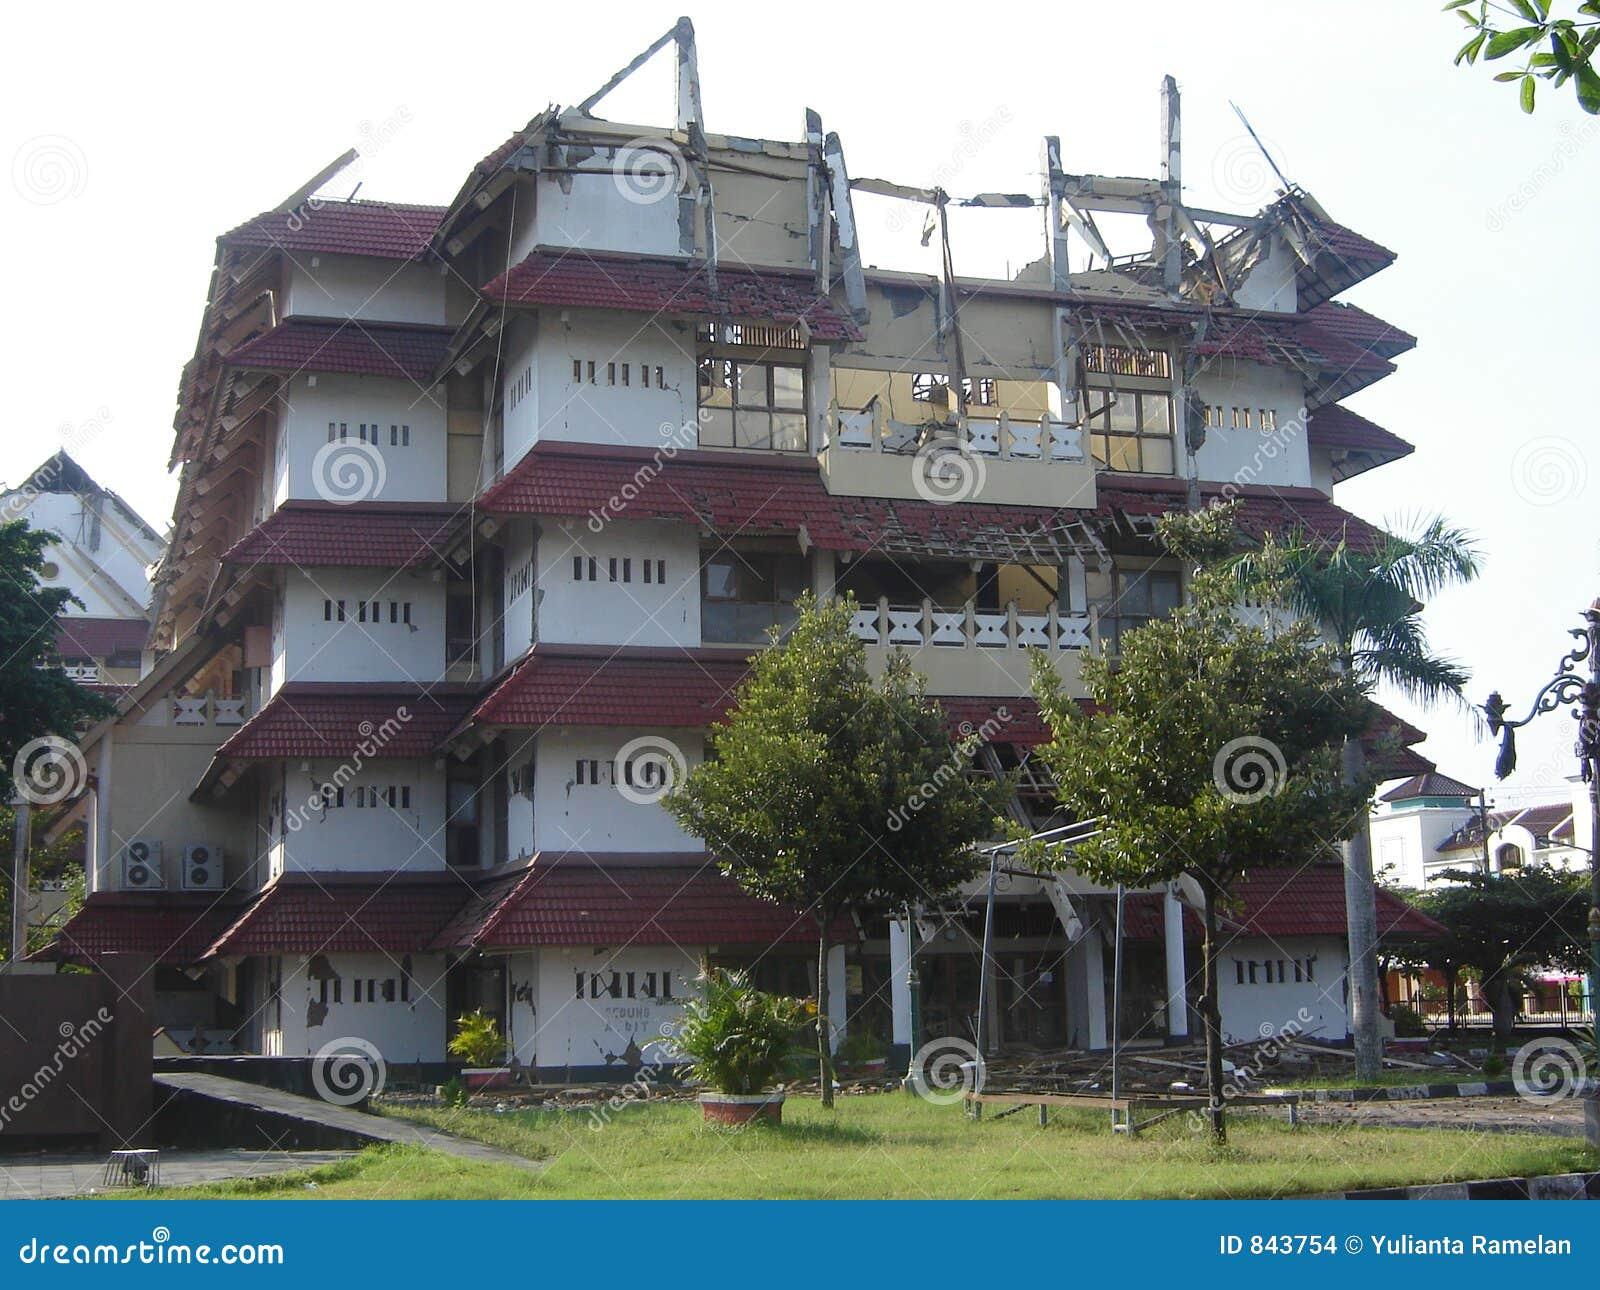 Earthquake effect